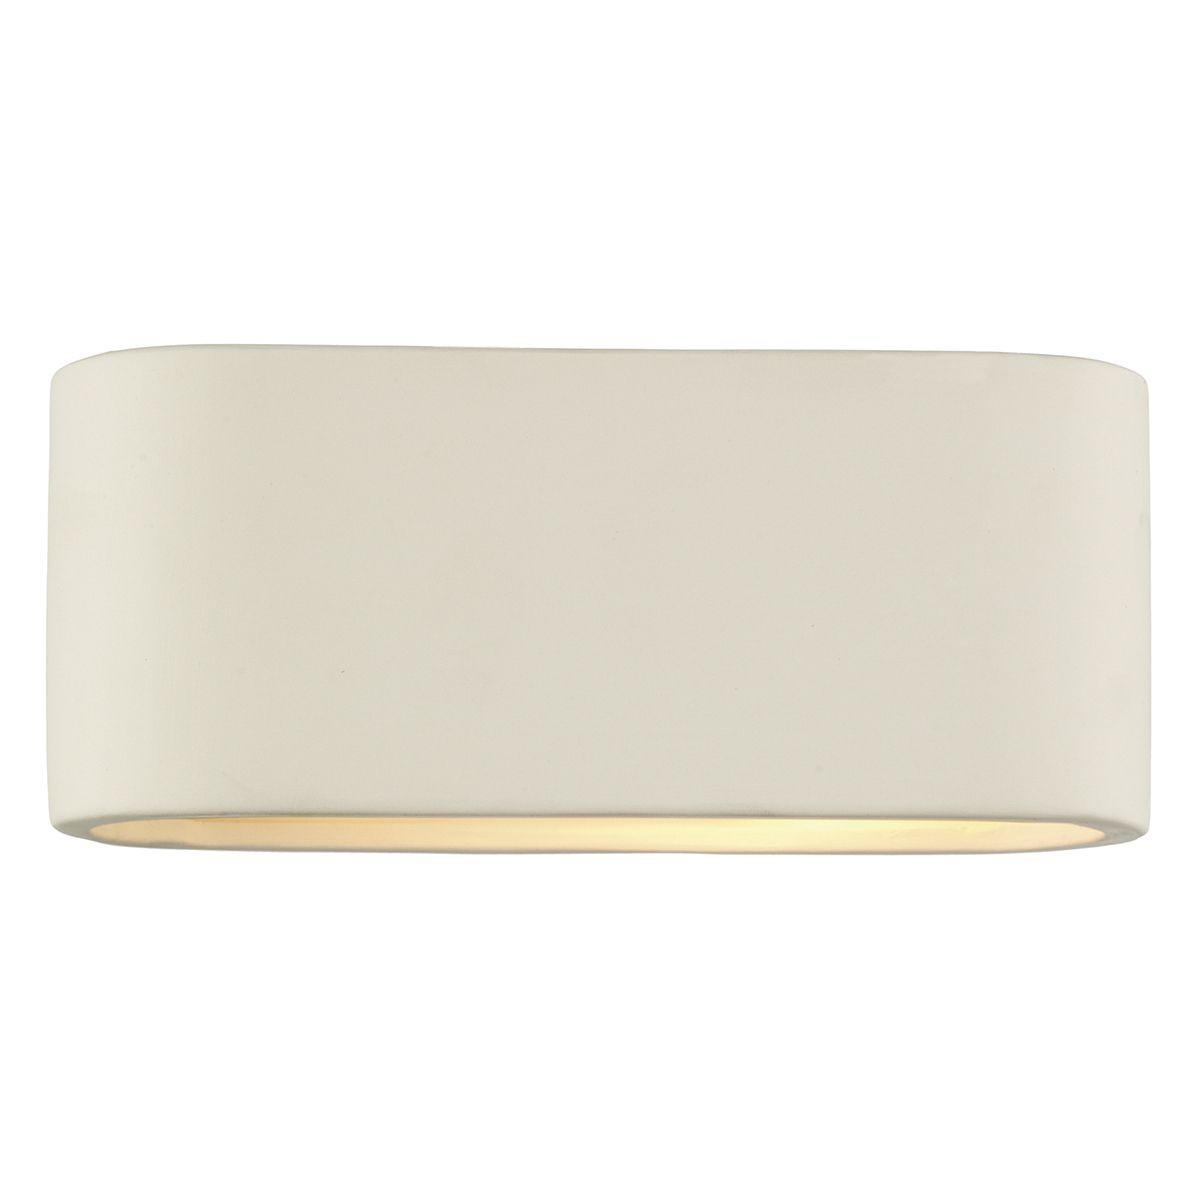 Small Solar Wall Lights : Axton Ceramic Wall Light - Small